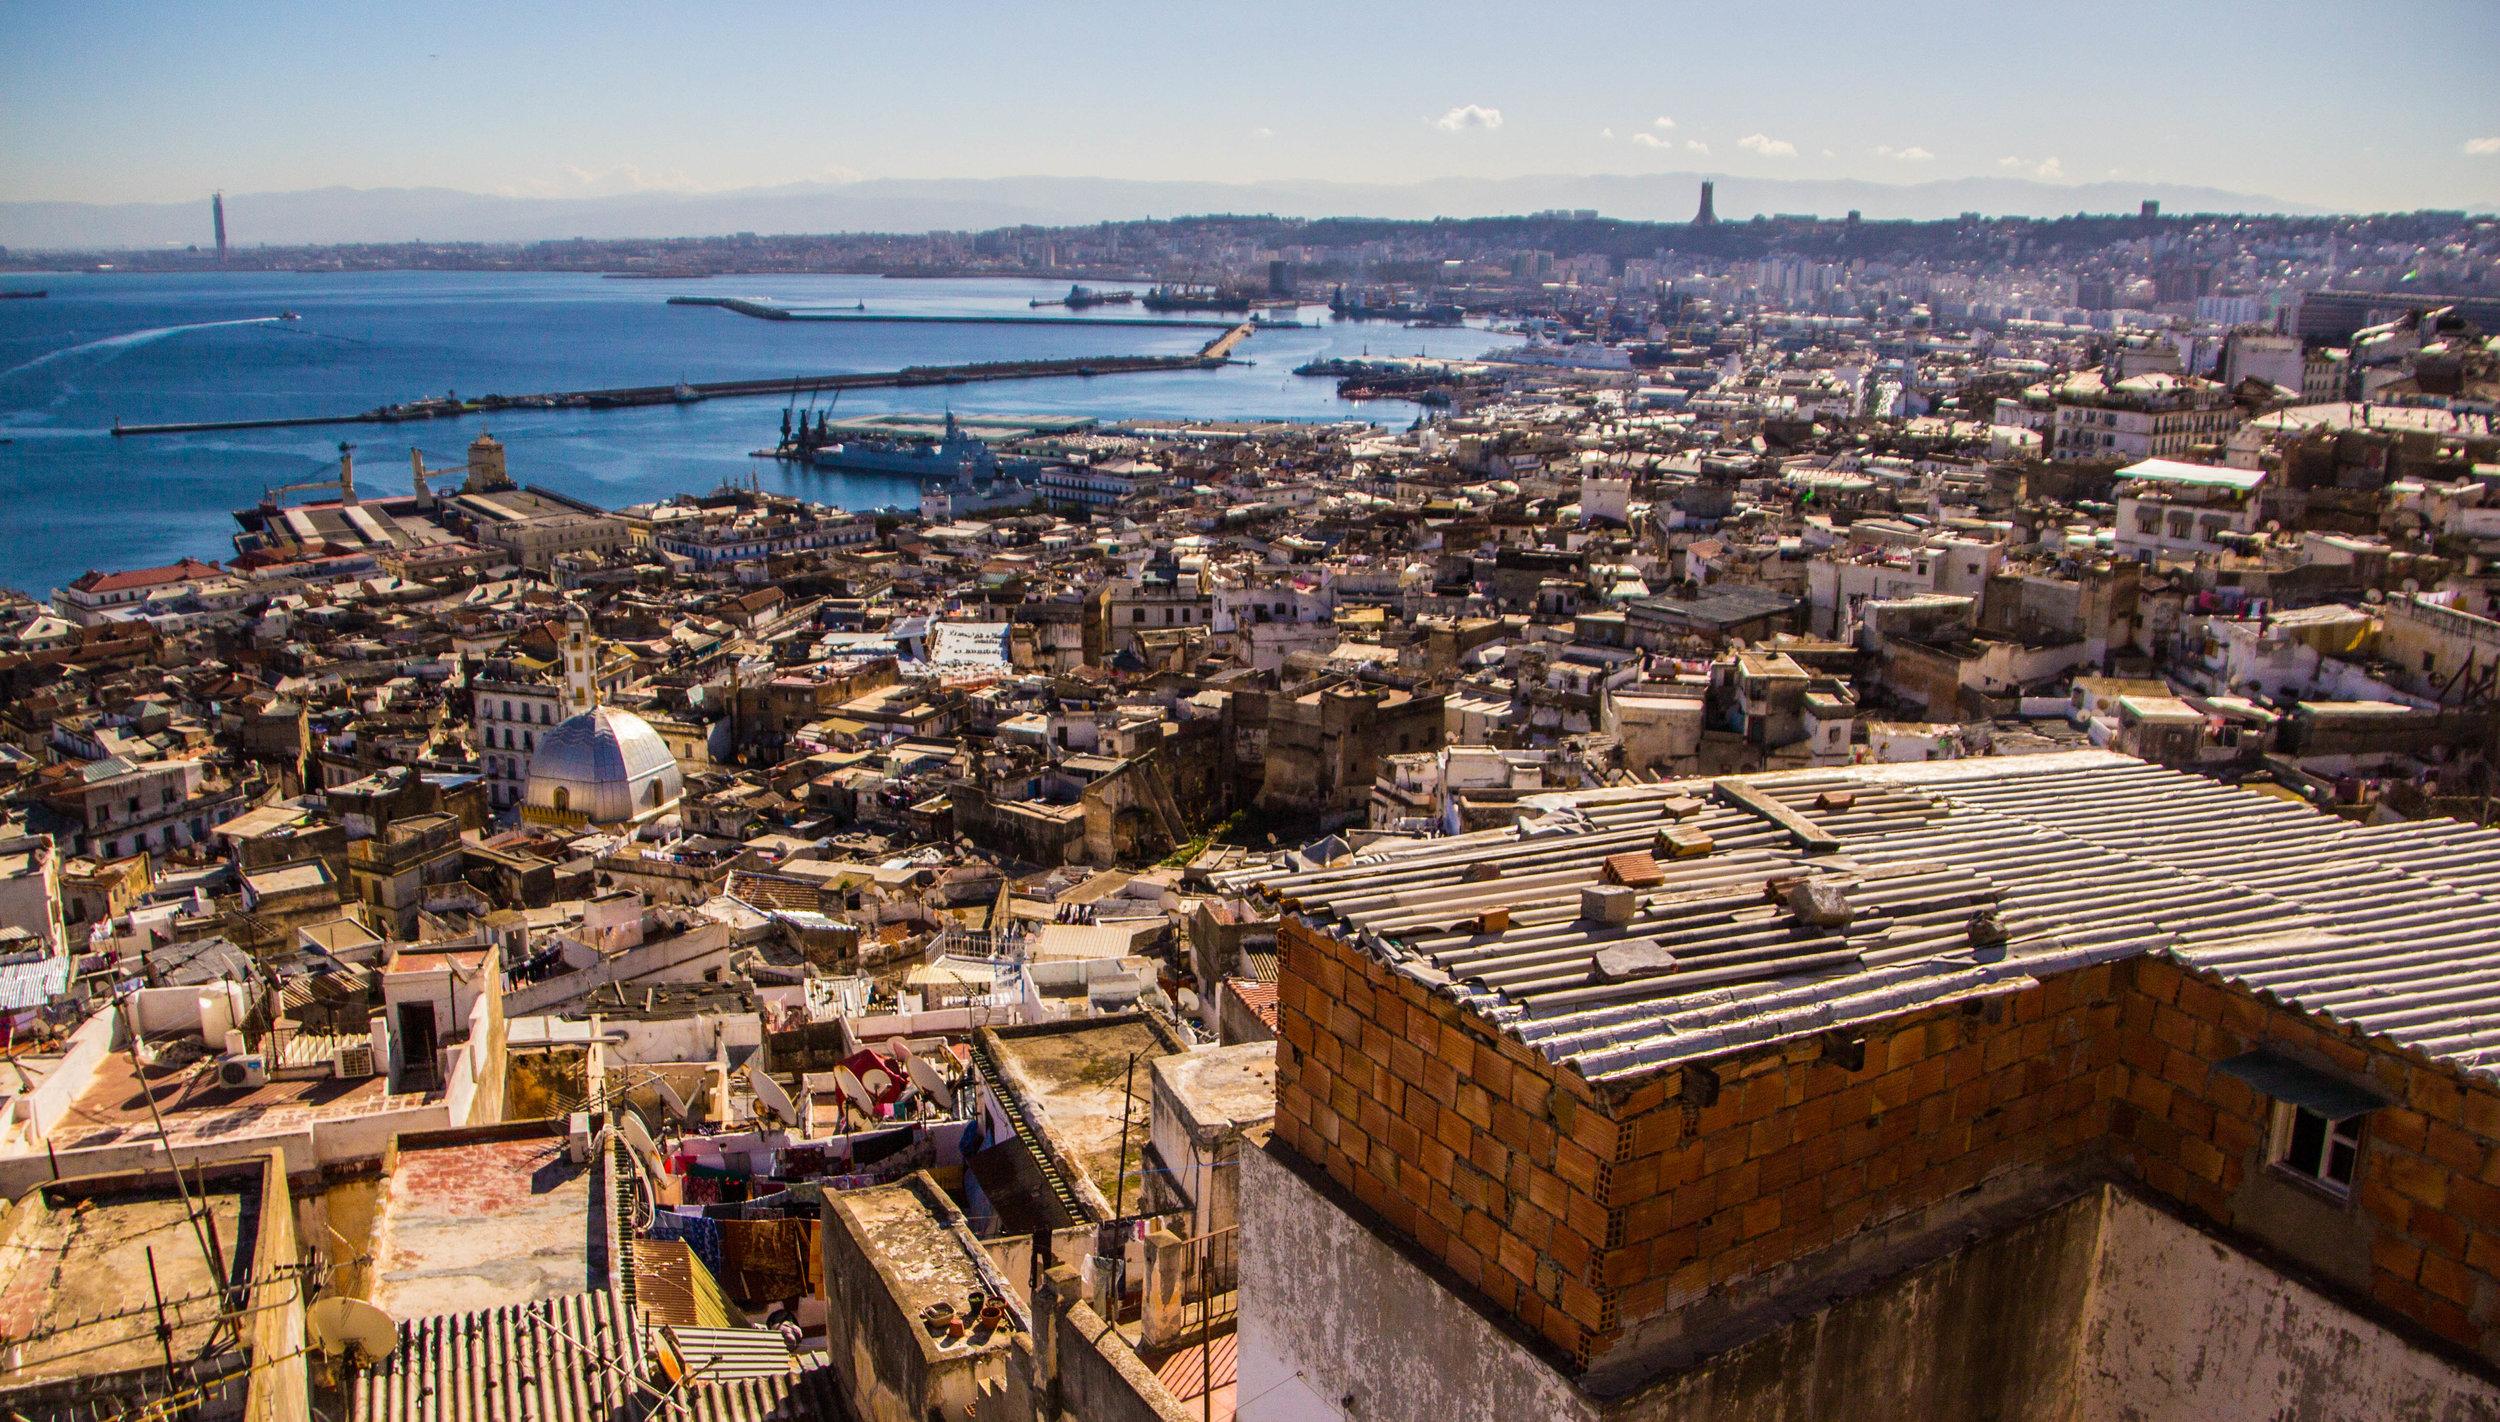 casbah-from-above-algiers-algeria-3.jpg